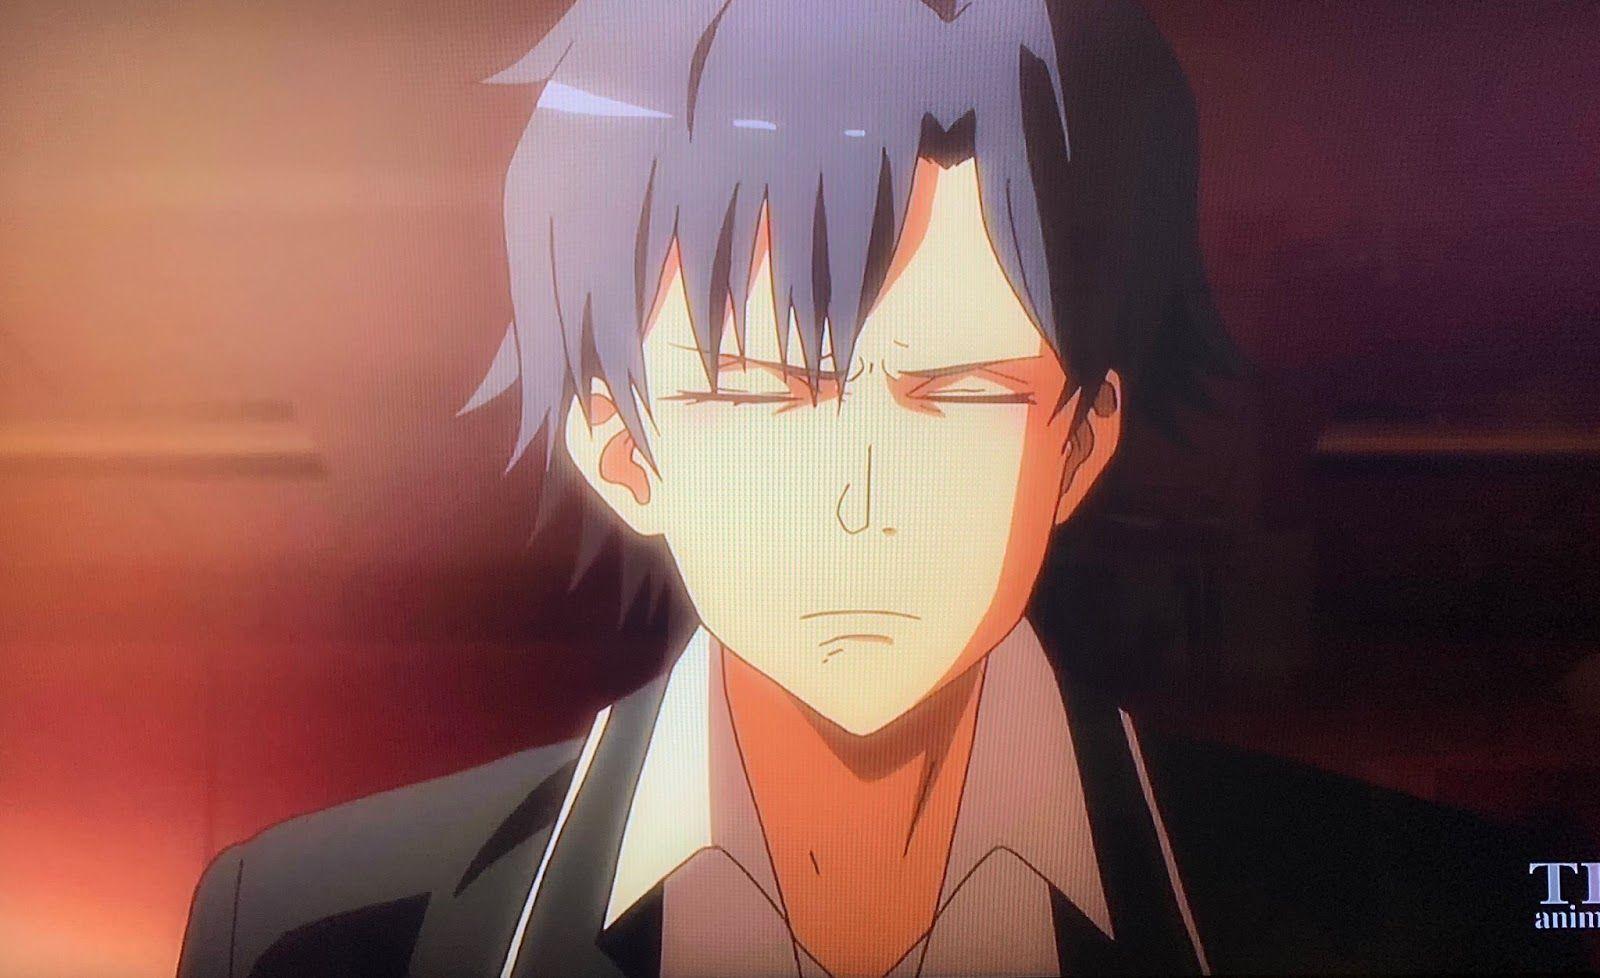 Oregairu Season 3 Episode 2 di 2020 Novel, Sekolah